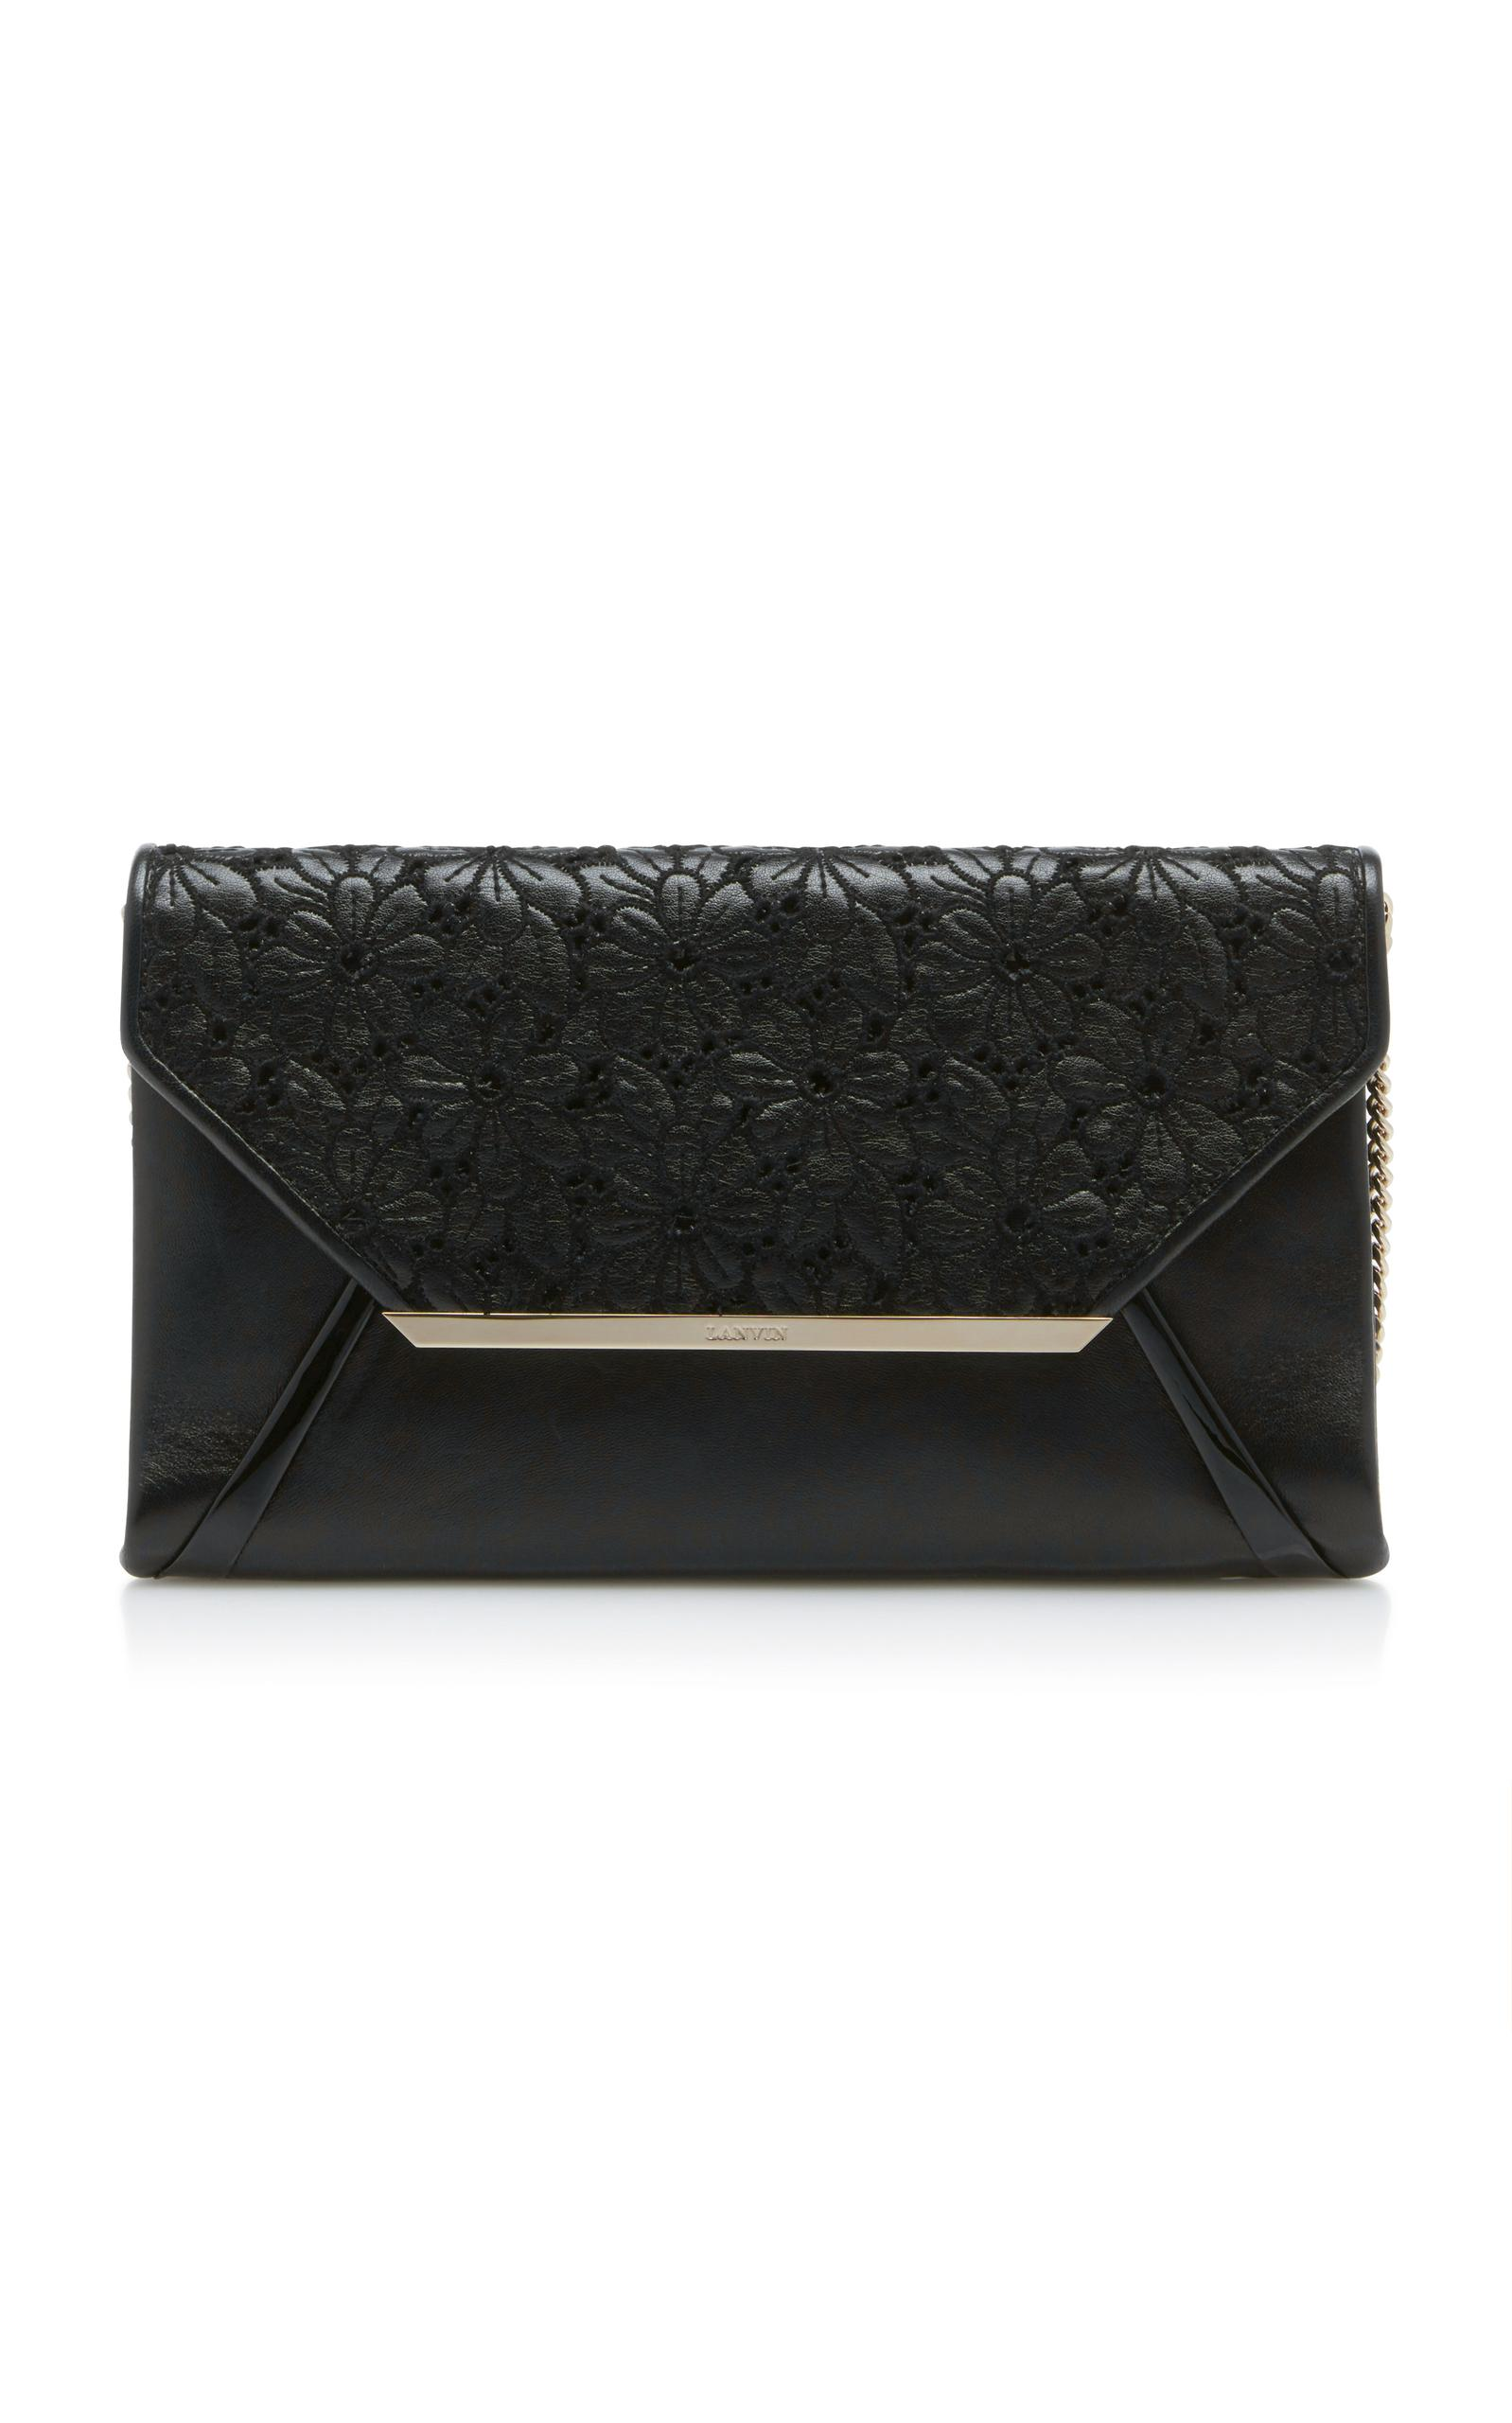 Lanvin Pochette Floral-Appliqued Leather Clutch In Black